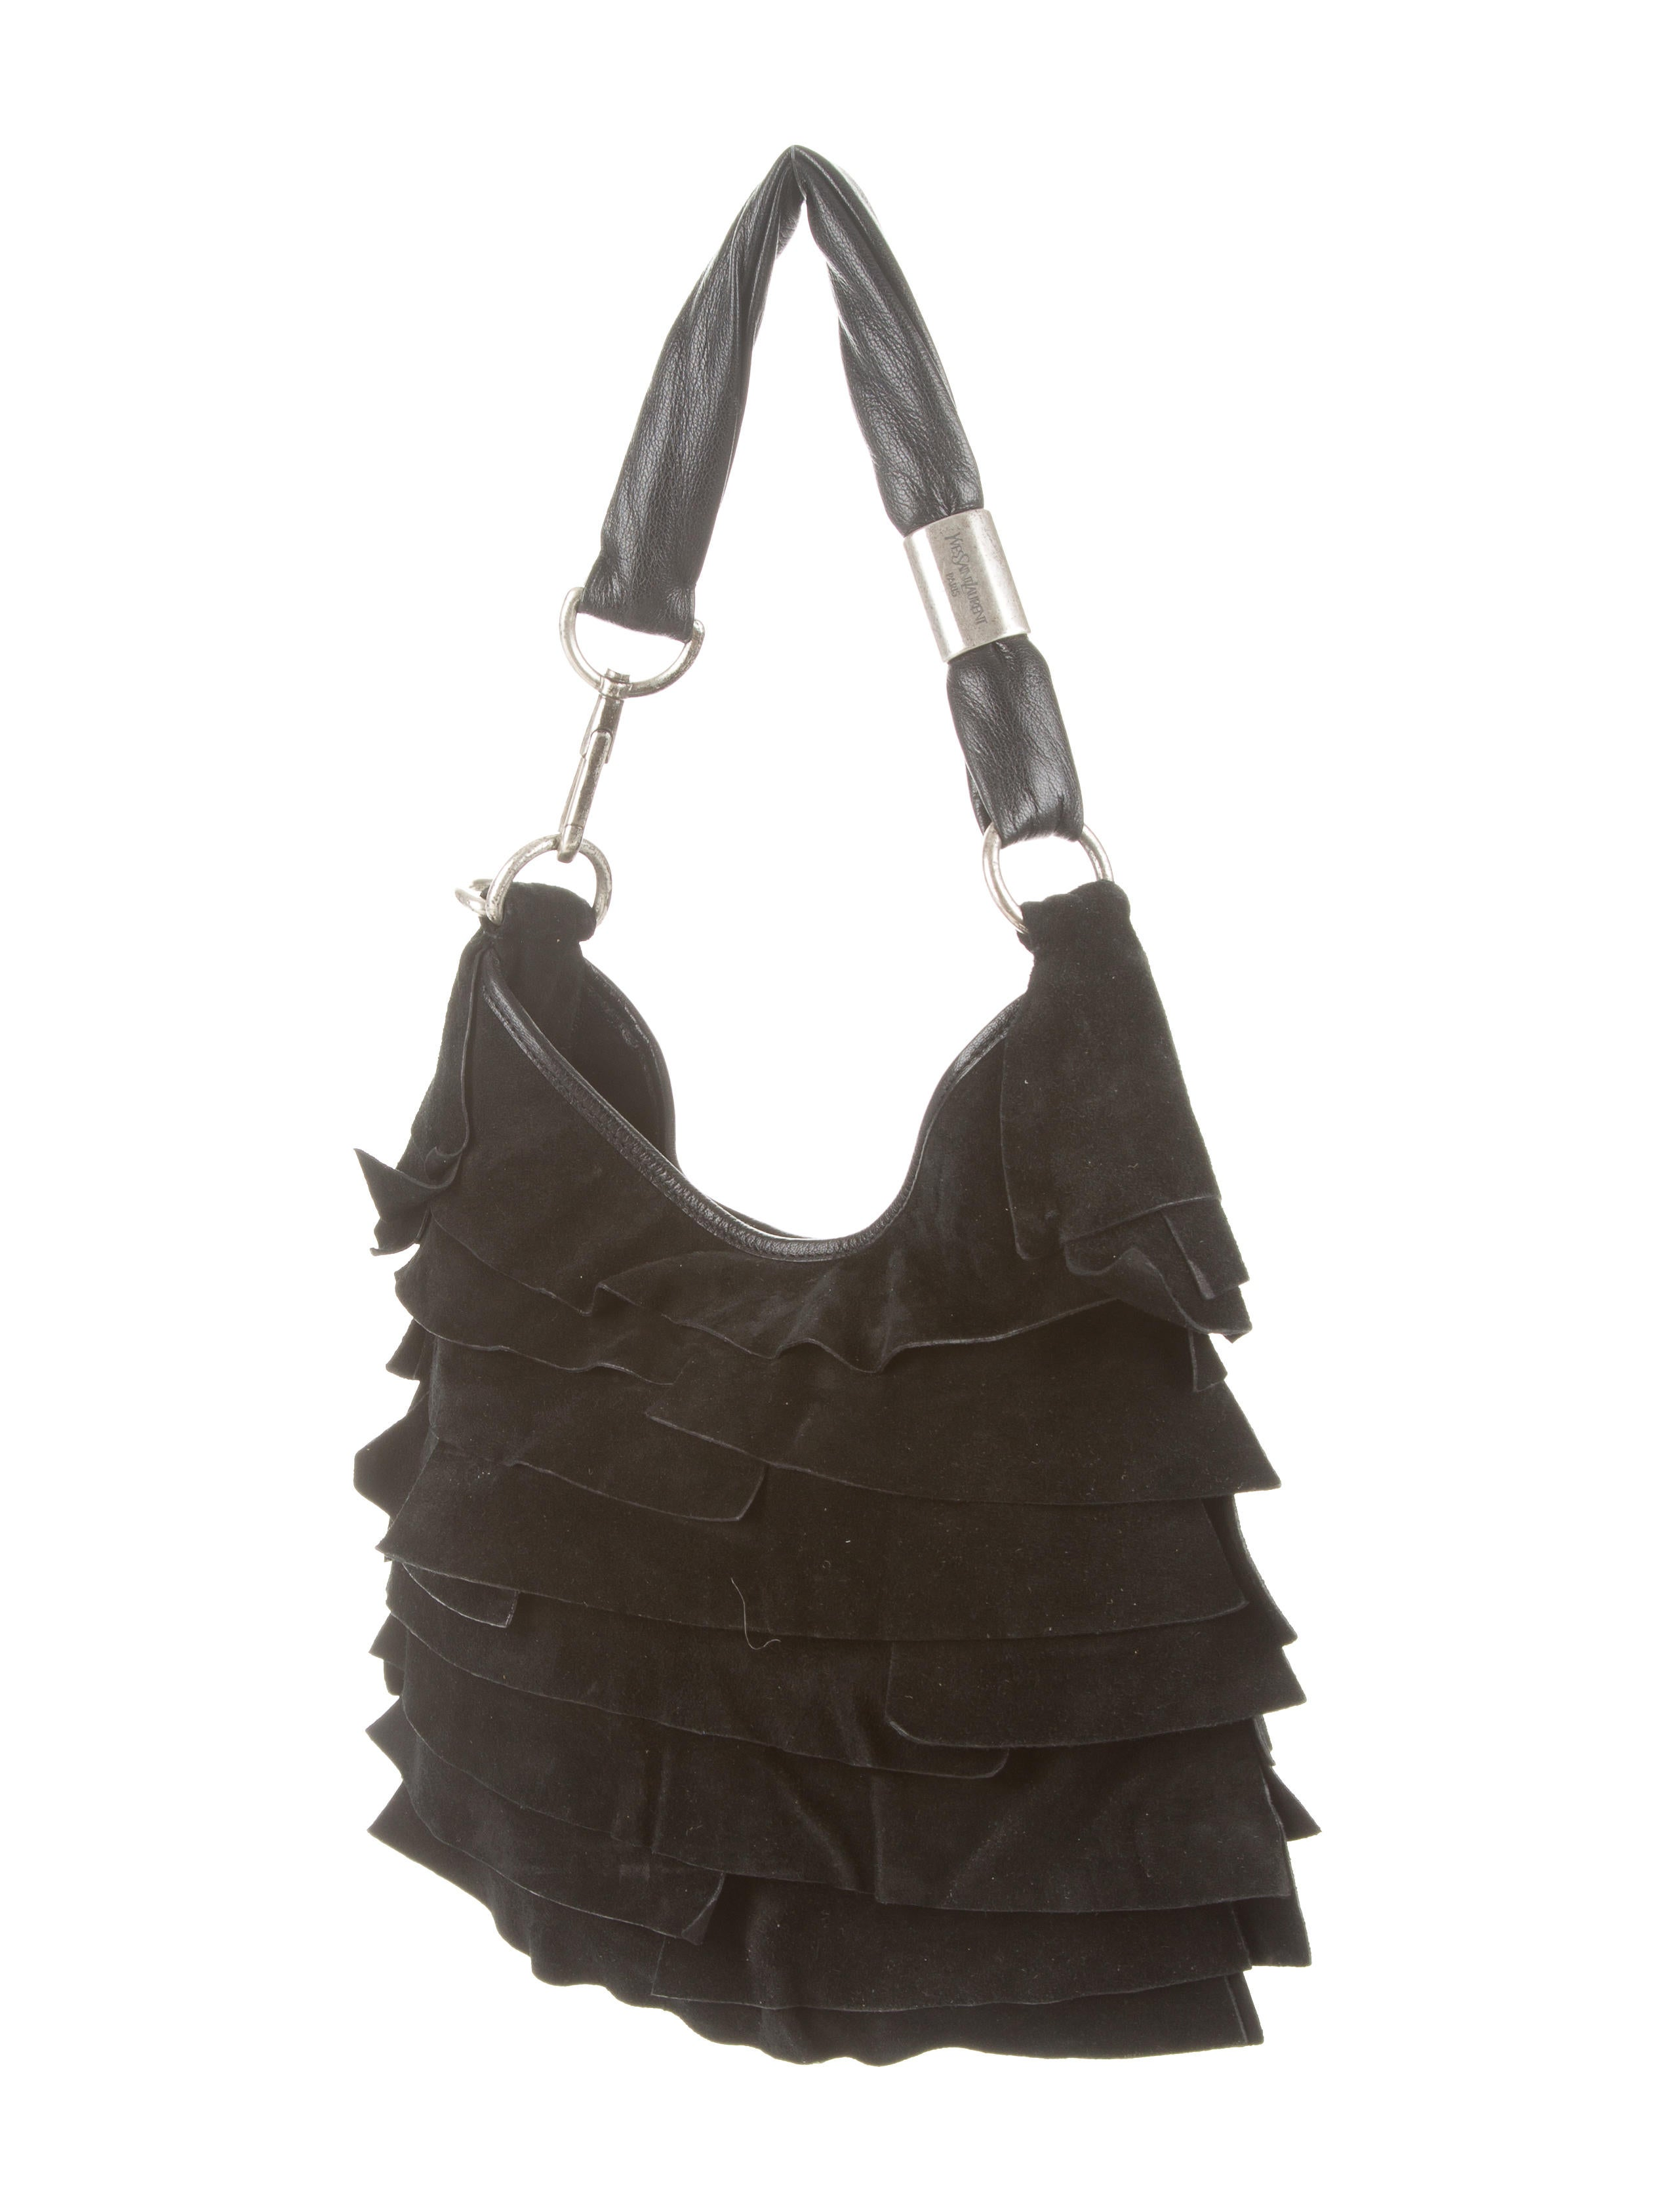 ysl chyc messenger - Yves Saint Laurent Ruffle St. Tropez Bag - Handbags - YVE38192 ...